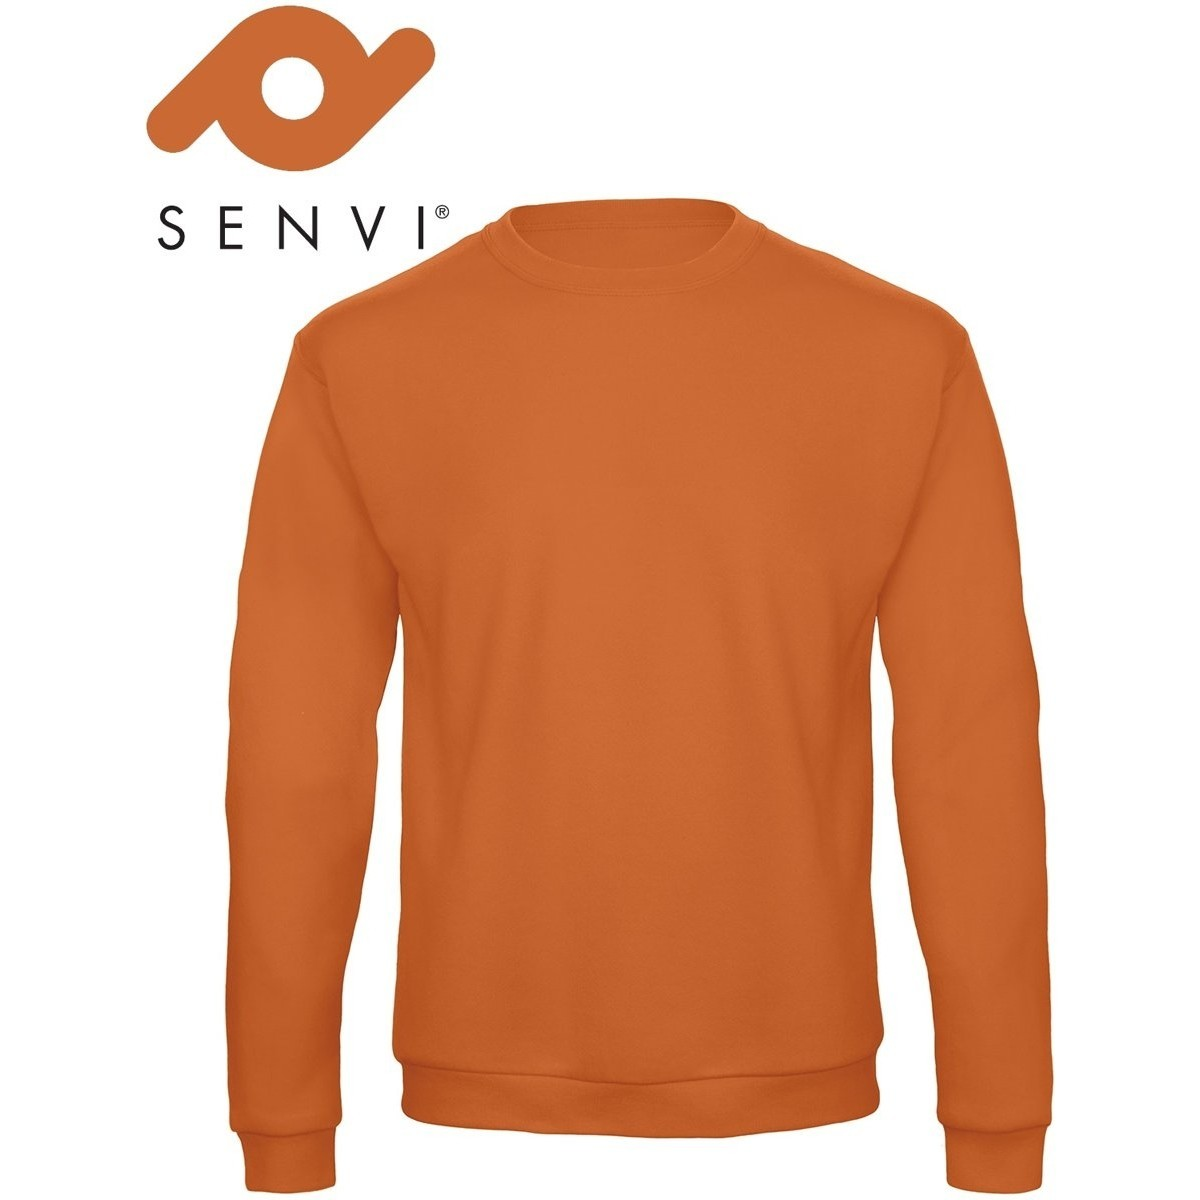 Senvi Basic Sweater (Kleur: Oranje) - (Maat XXXXL - 4XL)